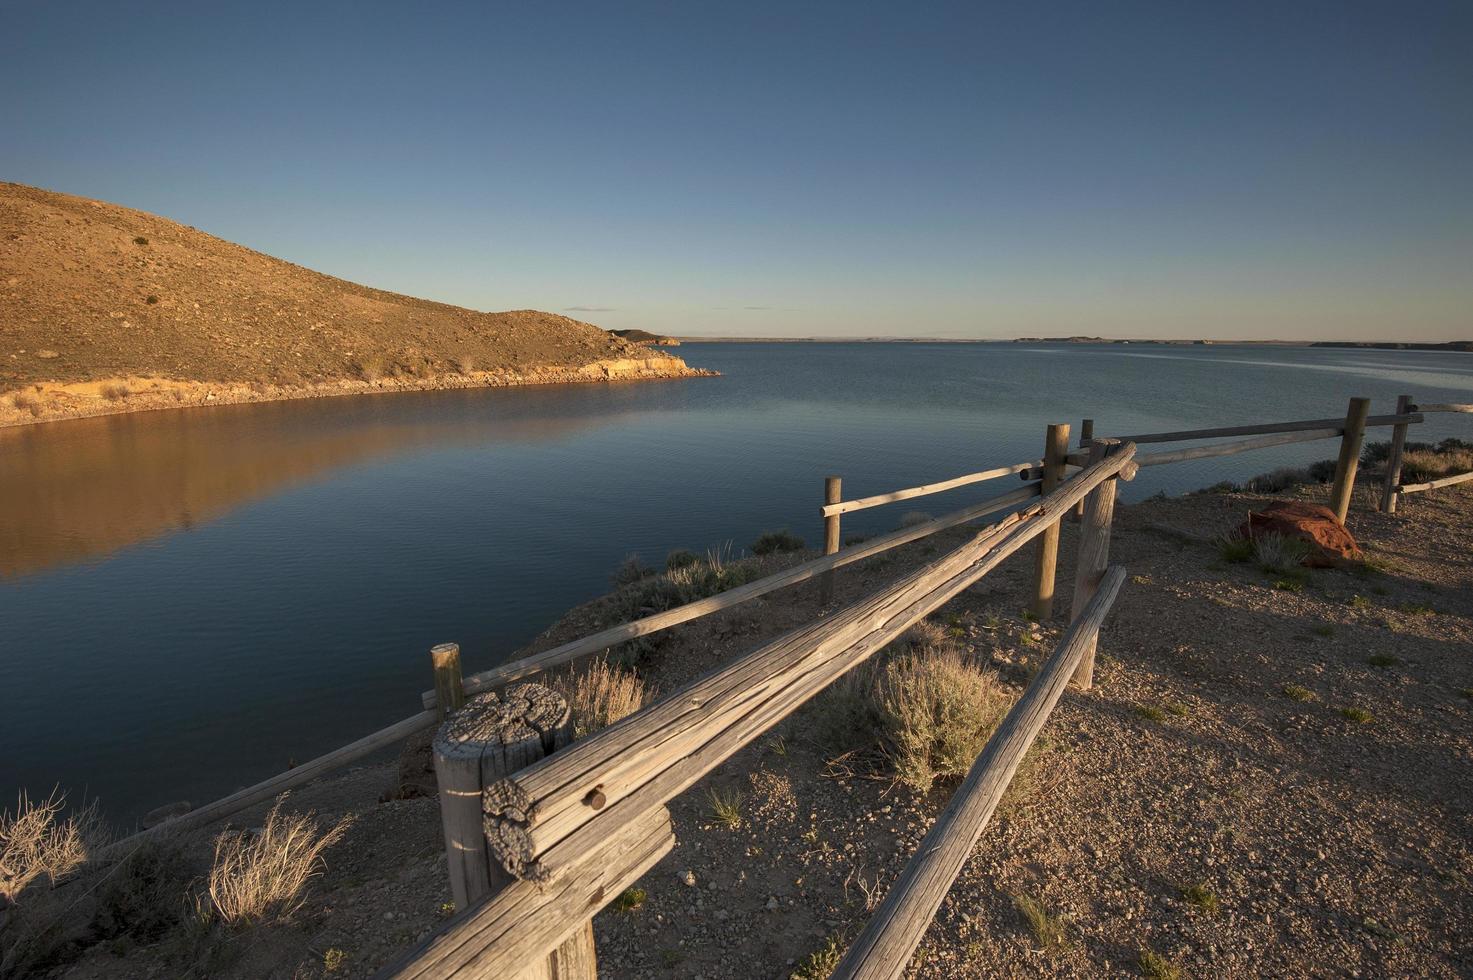 valla de madera en el mar foto